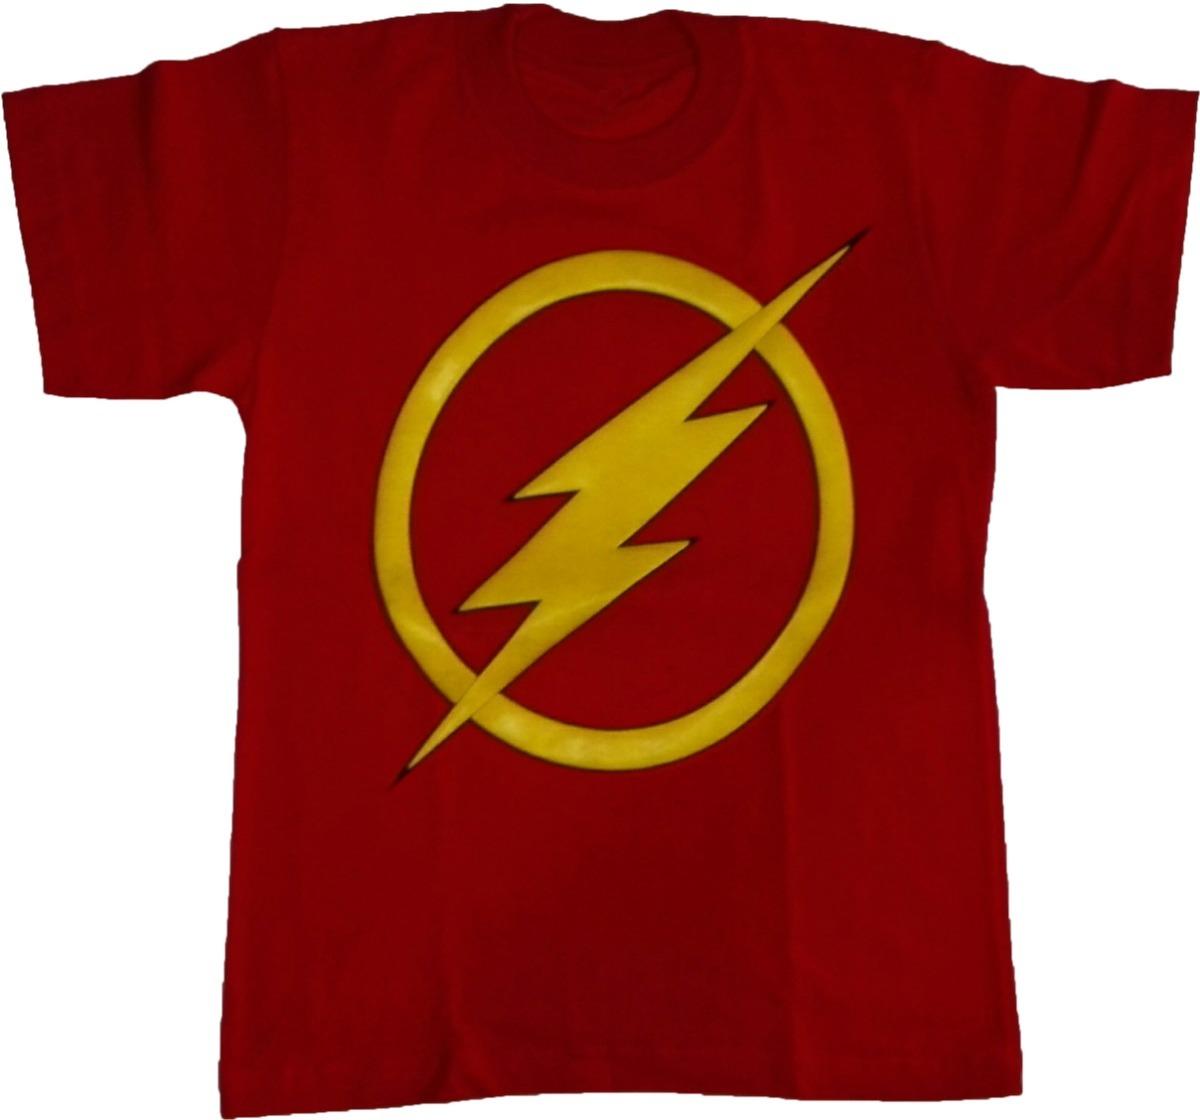 624ca11ea Camiseta Flash Niño Talla (2-16) Estampada Tienda Urbanoz -   19.950 ...